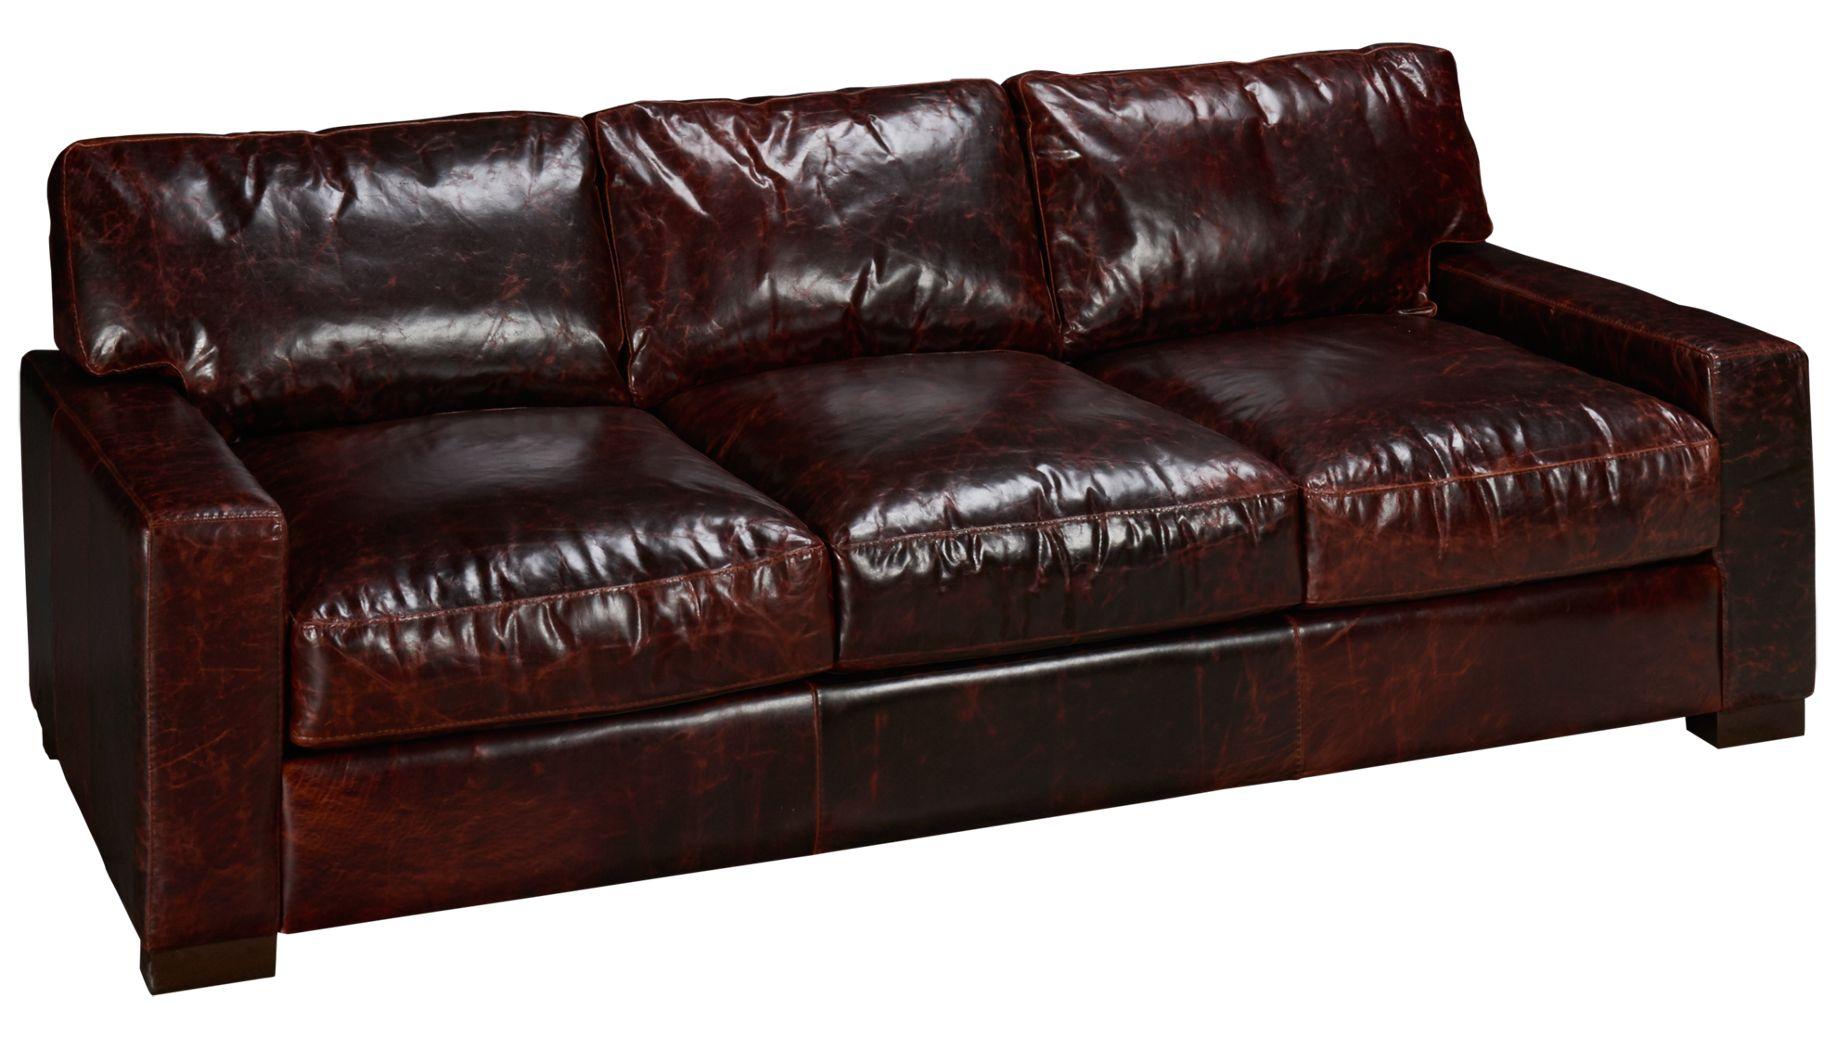 Brompton Leather Sofa Rs Gold Sofa